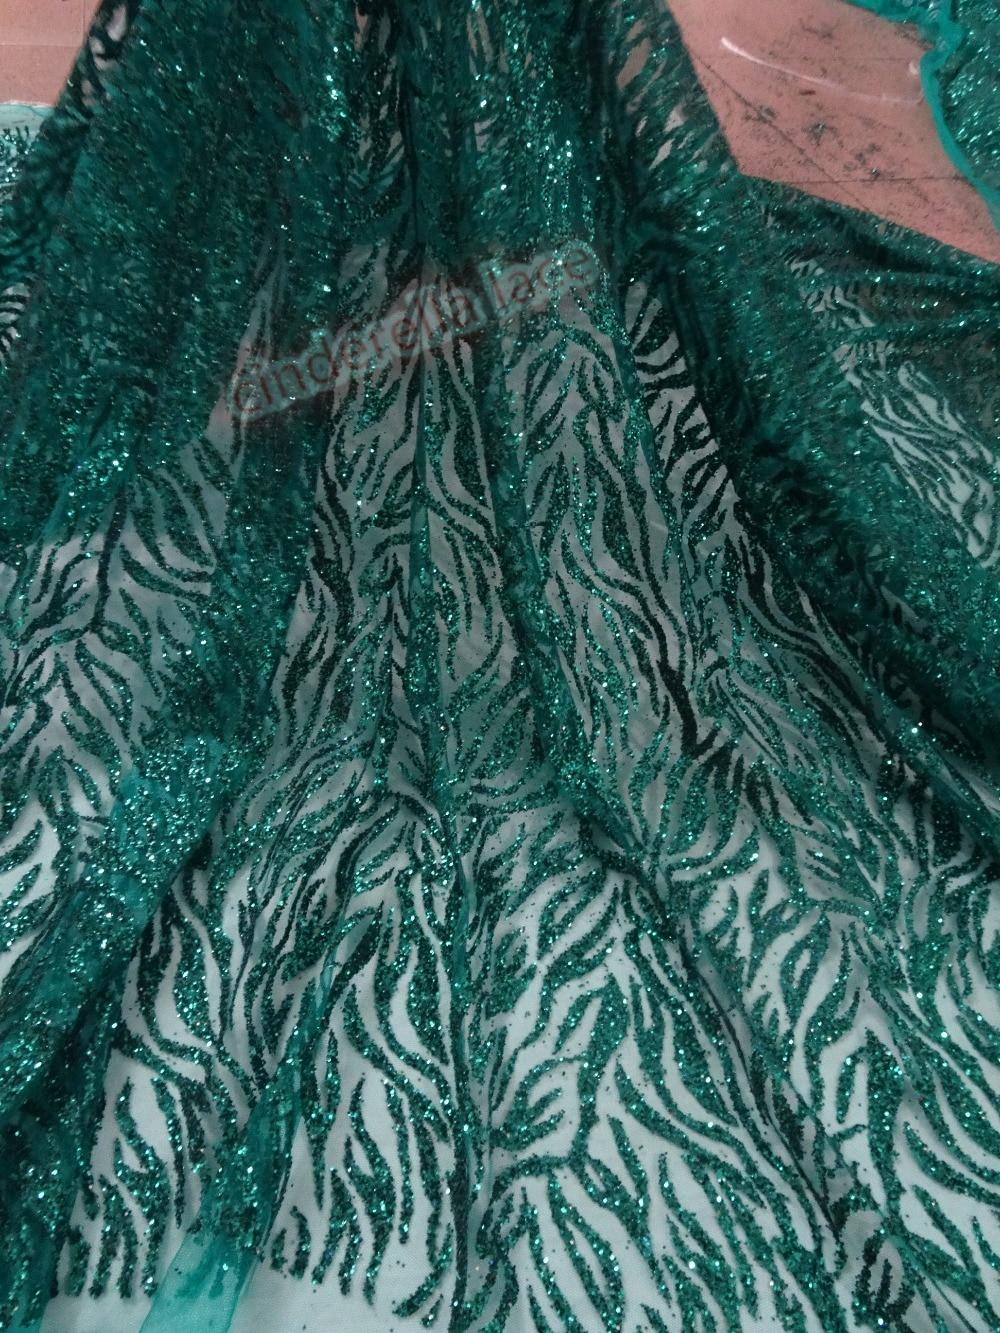 (5 yards/lot) 예쁜 JIANXI.C 42078 붙어 있던 반짝이 디자인 웨딩 드레스에 대 한 좋은 품질 아프리카 얇은 명주 그물 원단-에서레이스부터 홈 & 가든 의  그룹 1